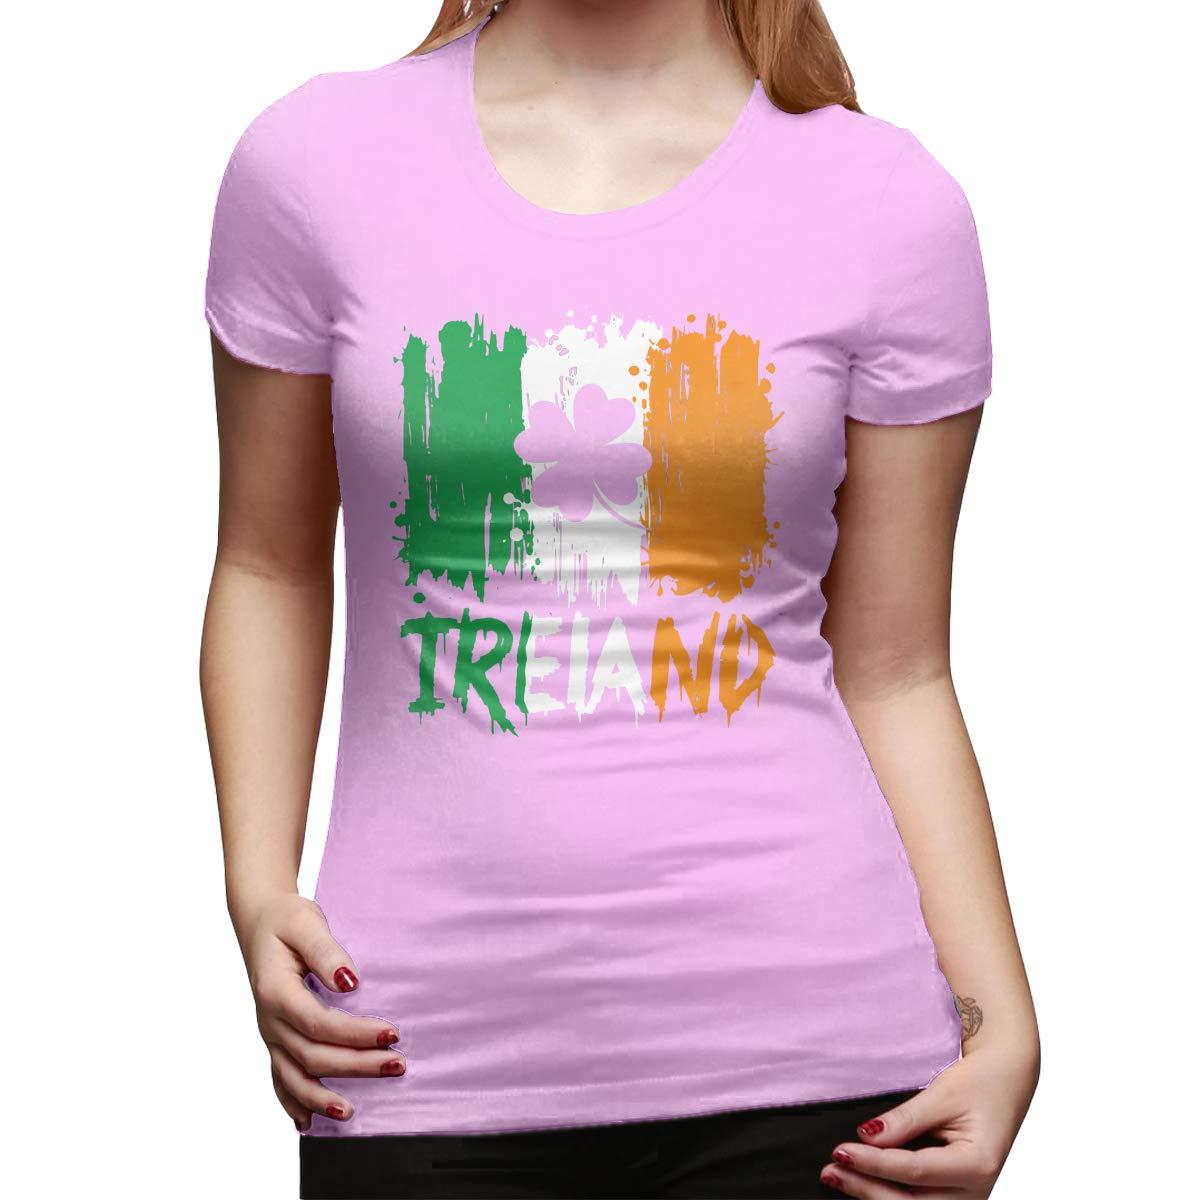 Irish American Flag Womens Basic Short Sleeve Top Crew Neck T-Shirts